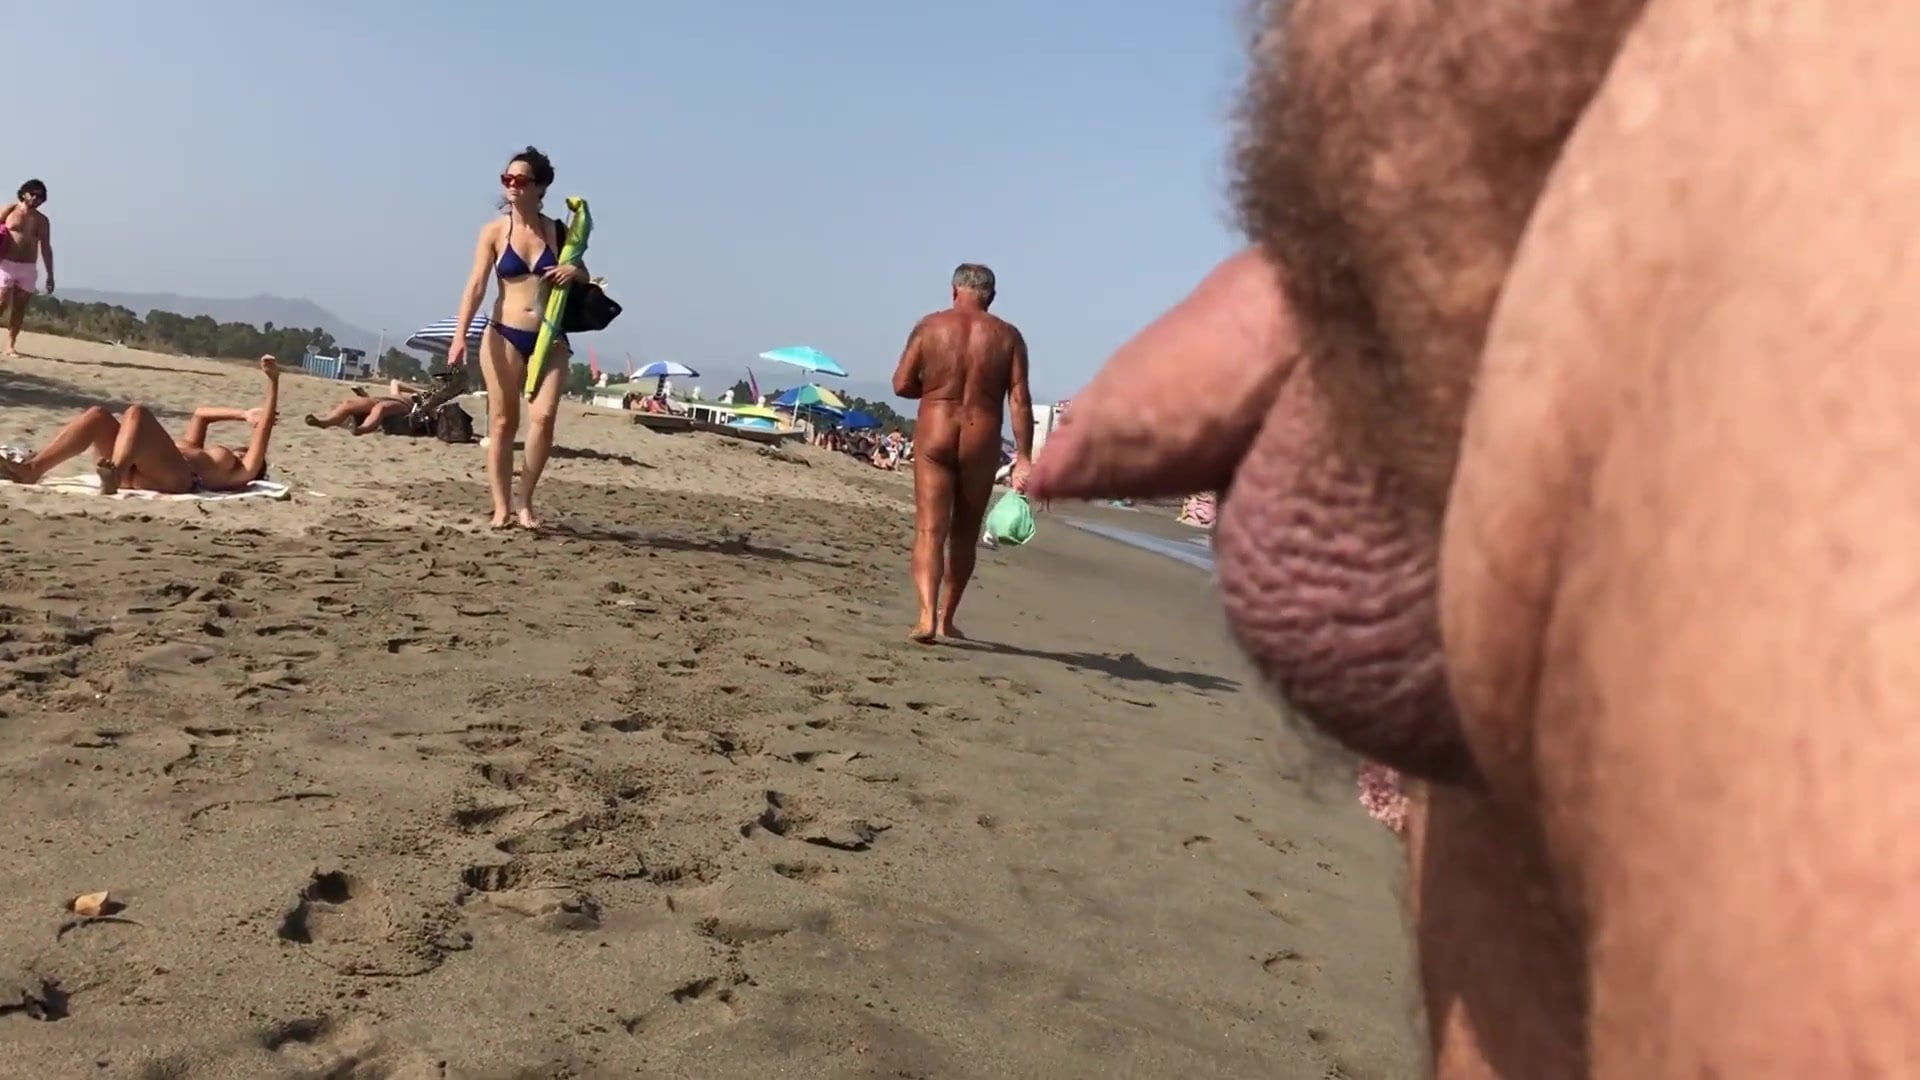 sexy nymphos in rreshen